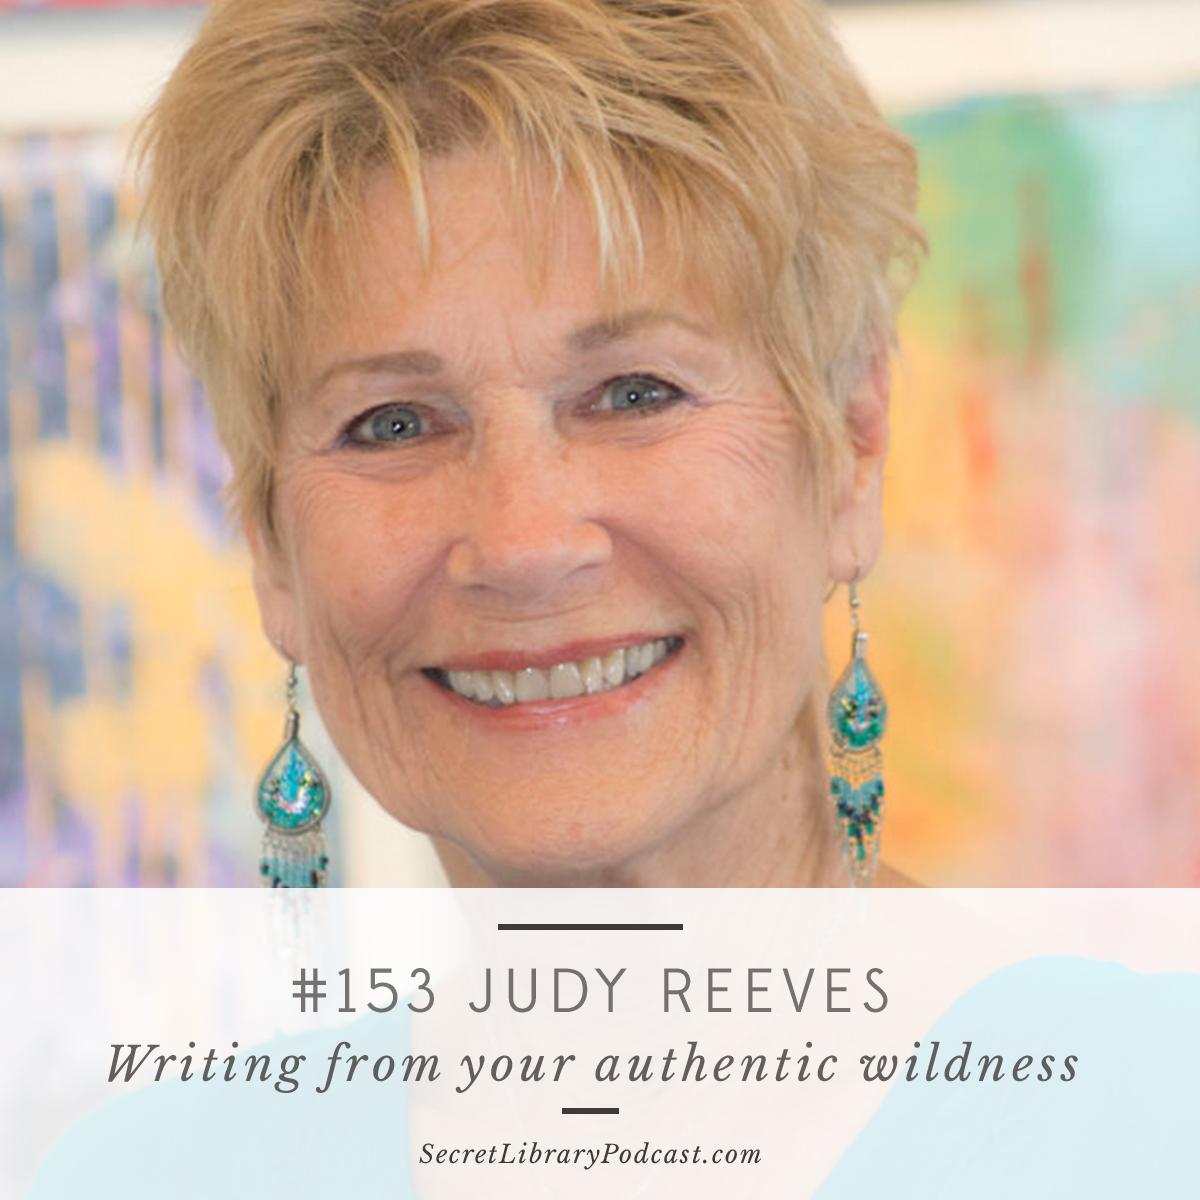 153-Judy-ReevesIG-Square.png